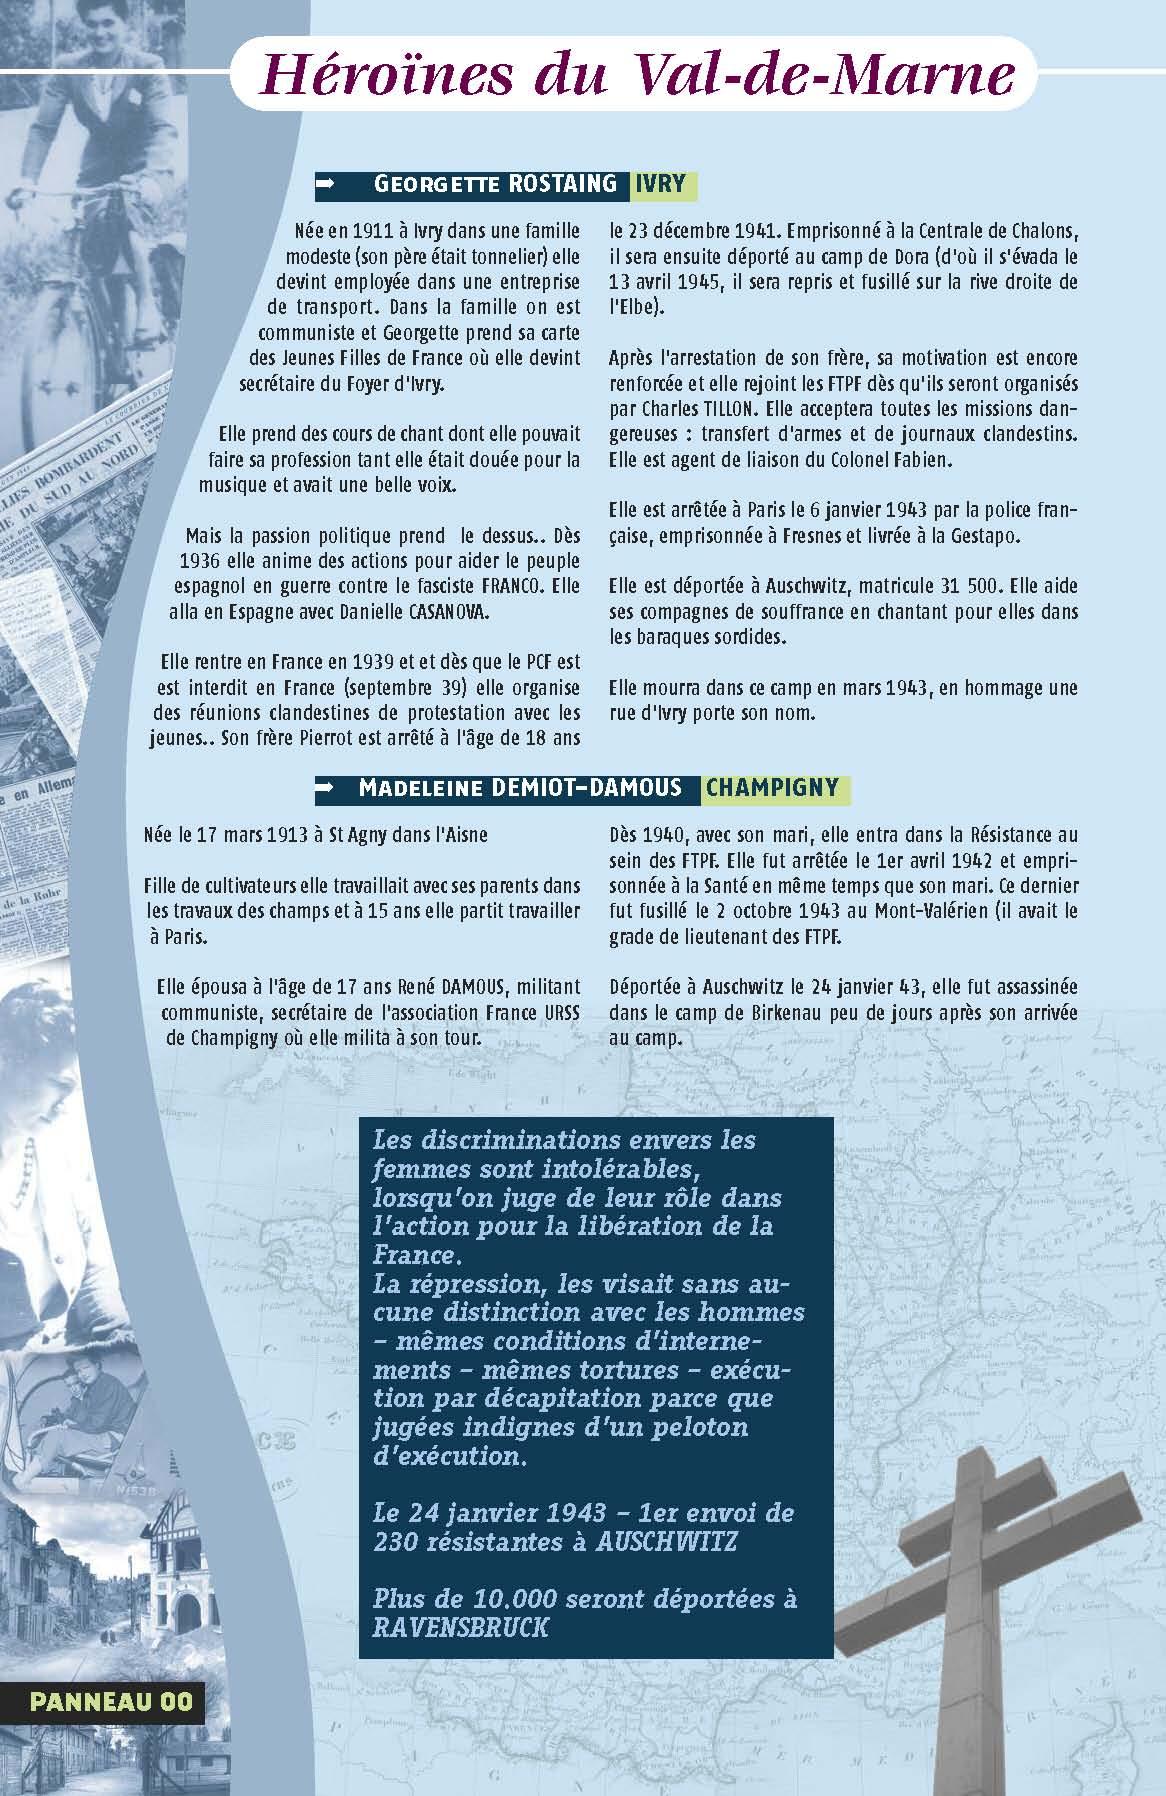 Pano8 11 page 1